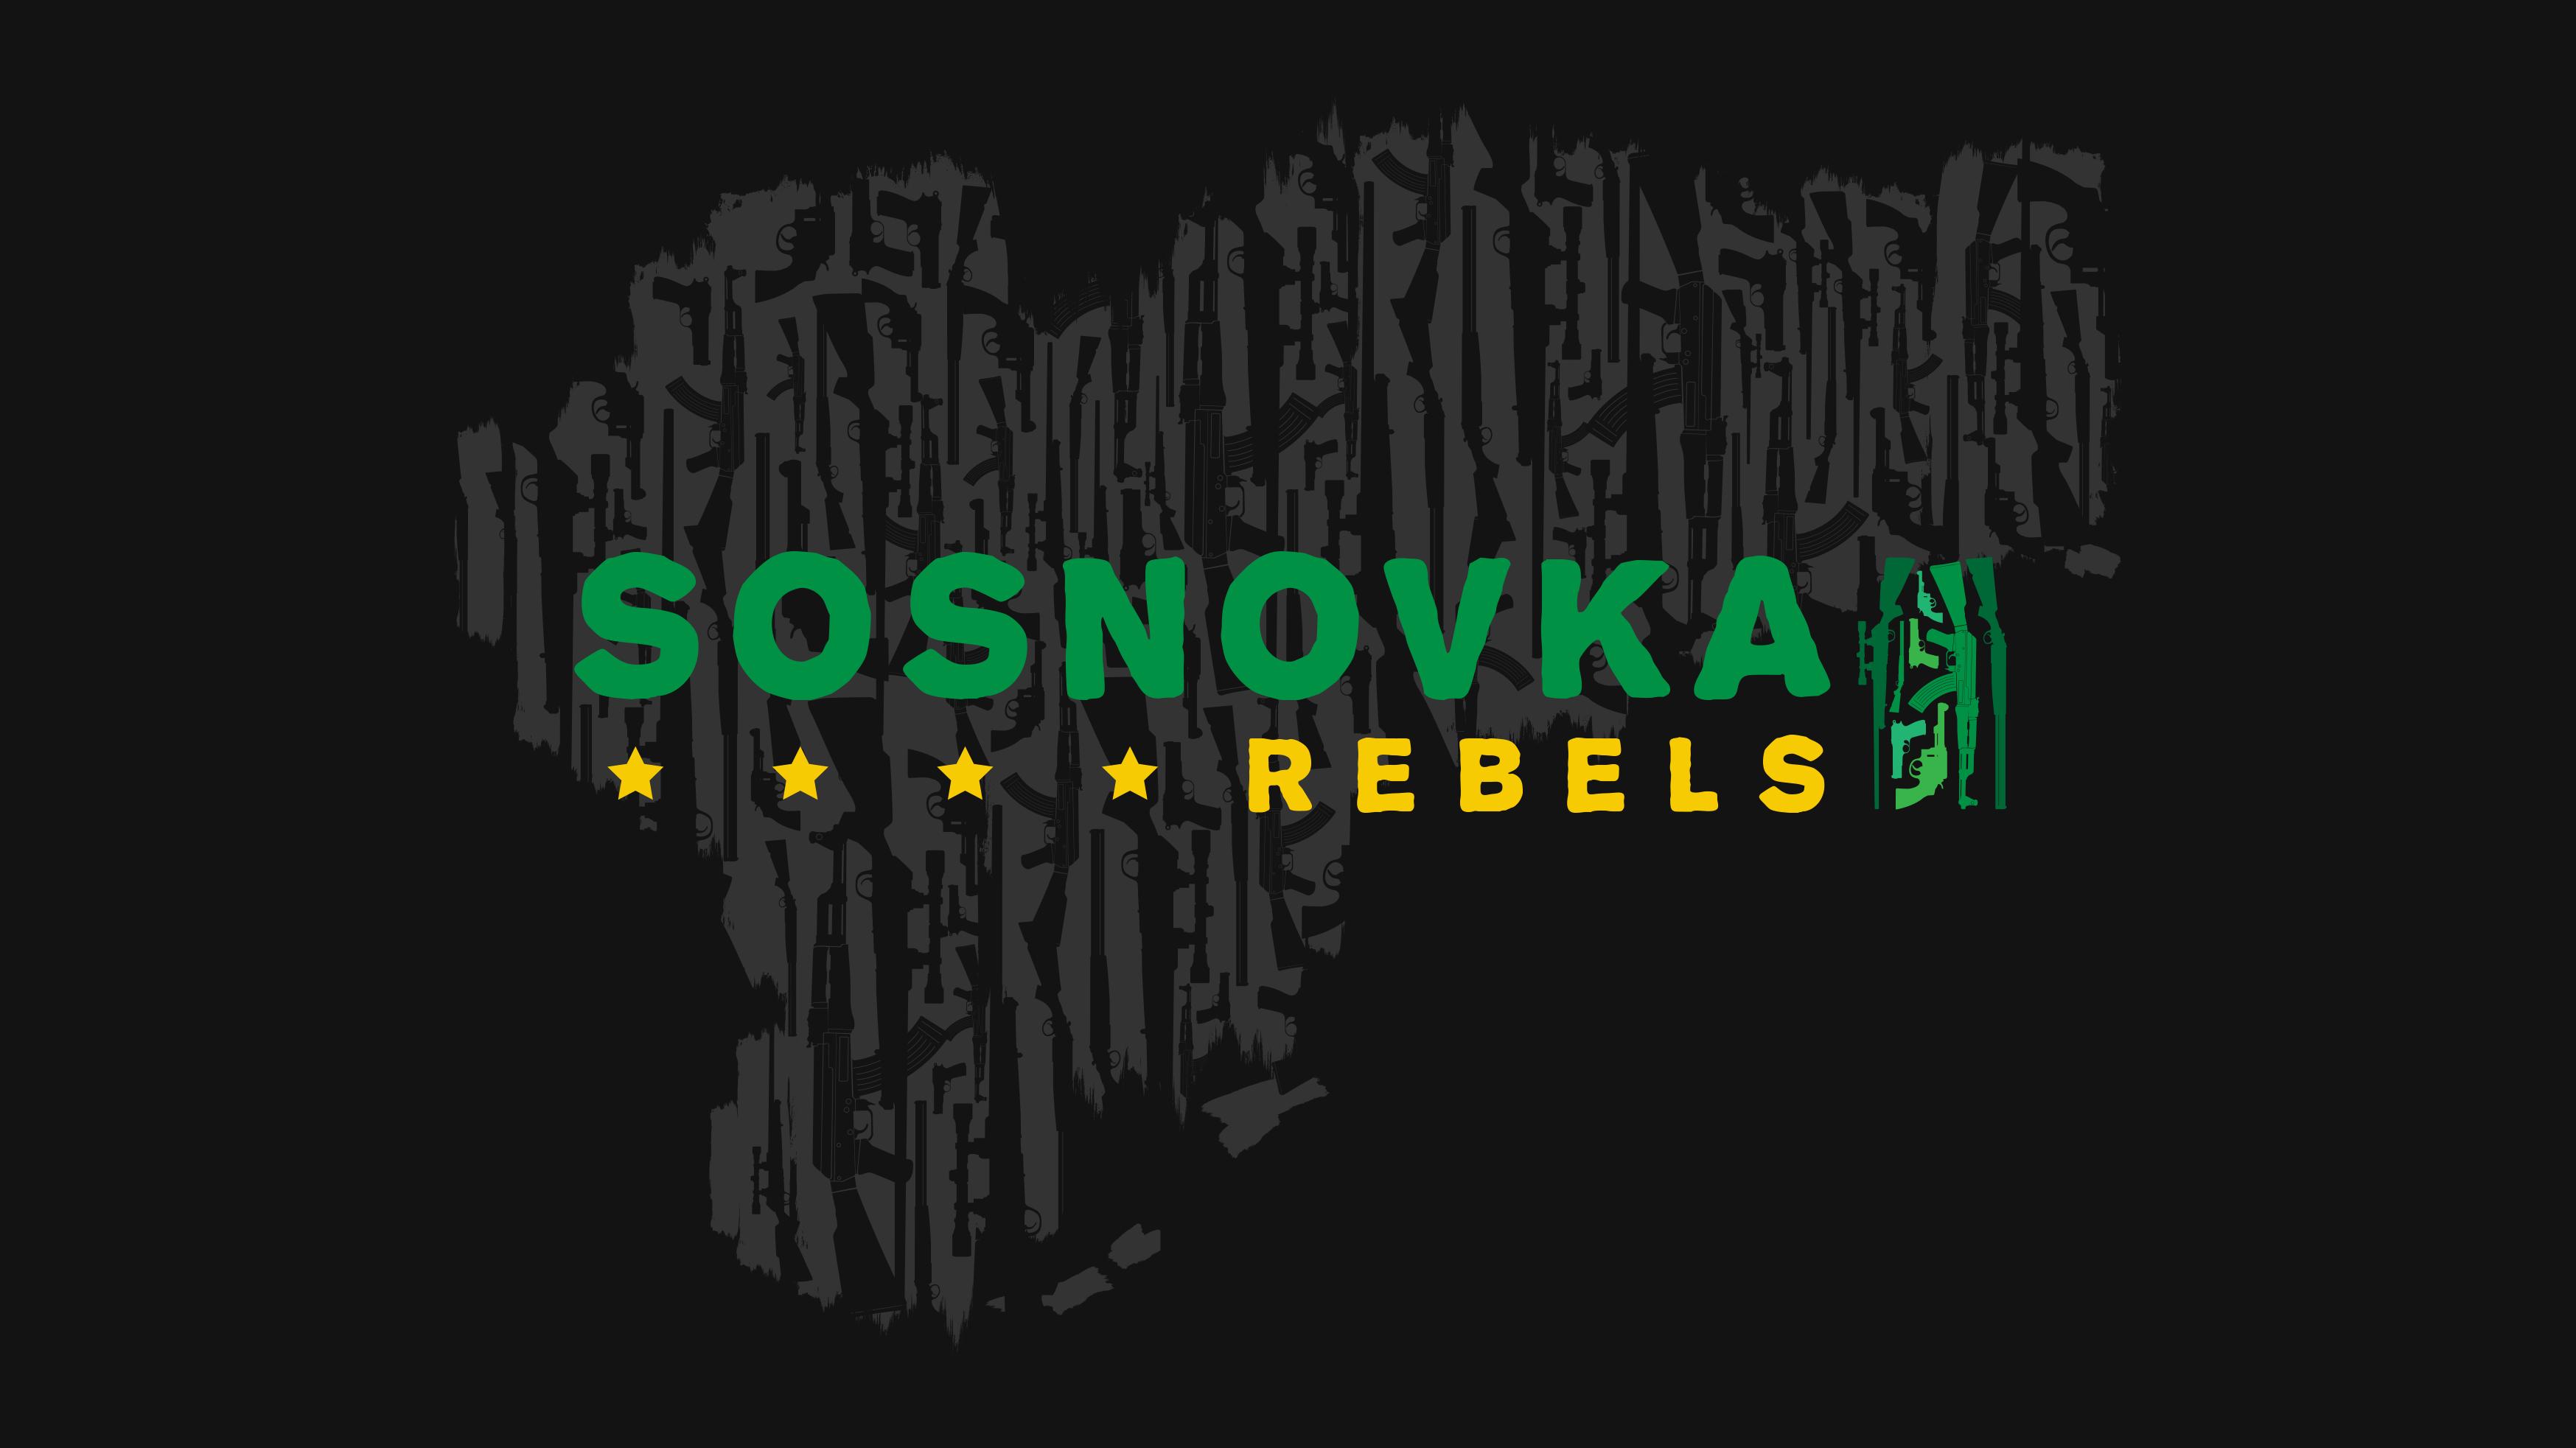 Sosnovka Rebels